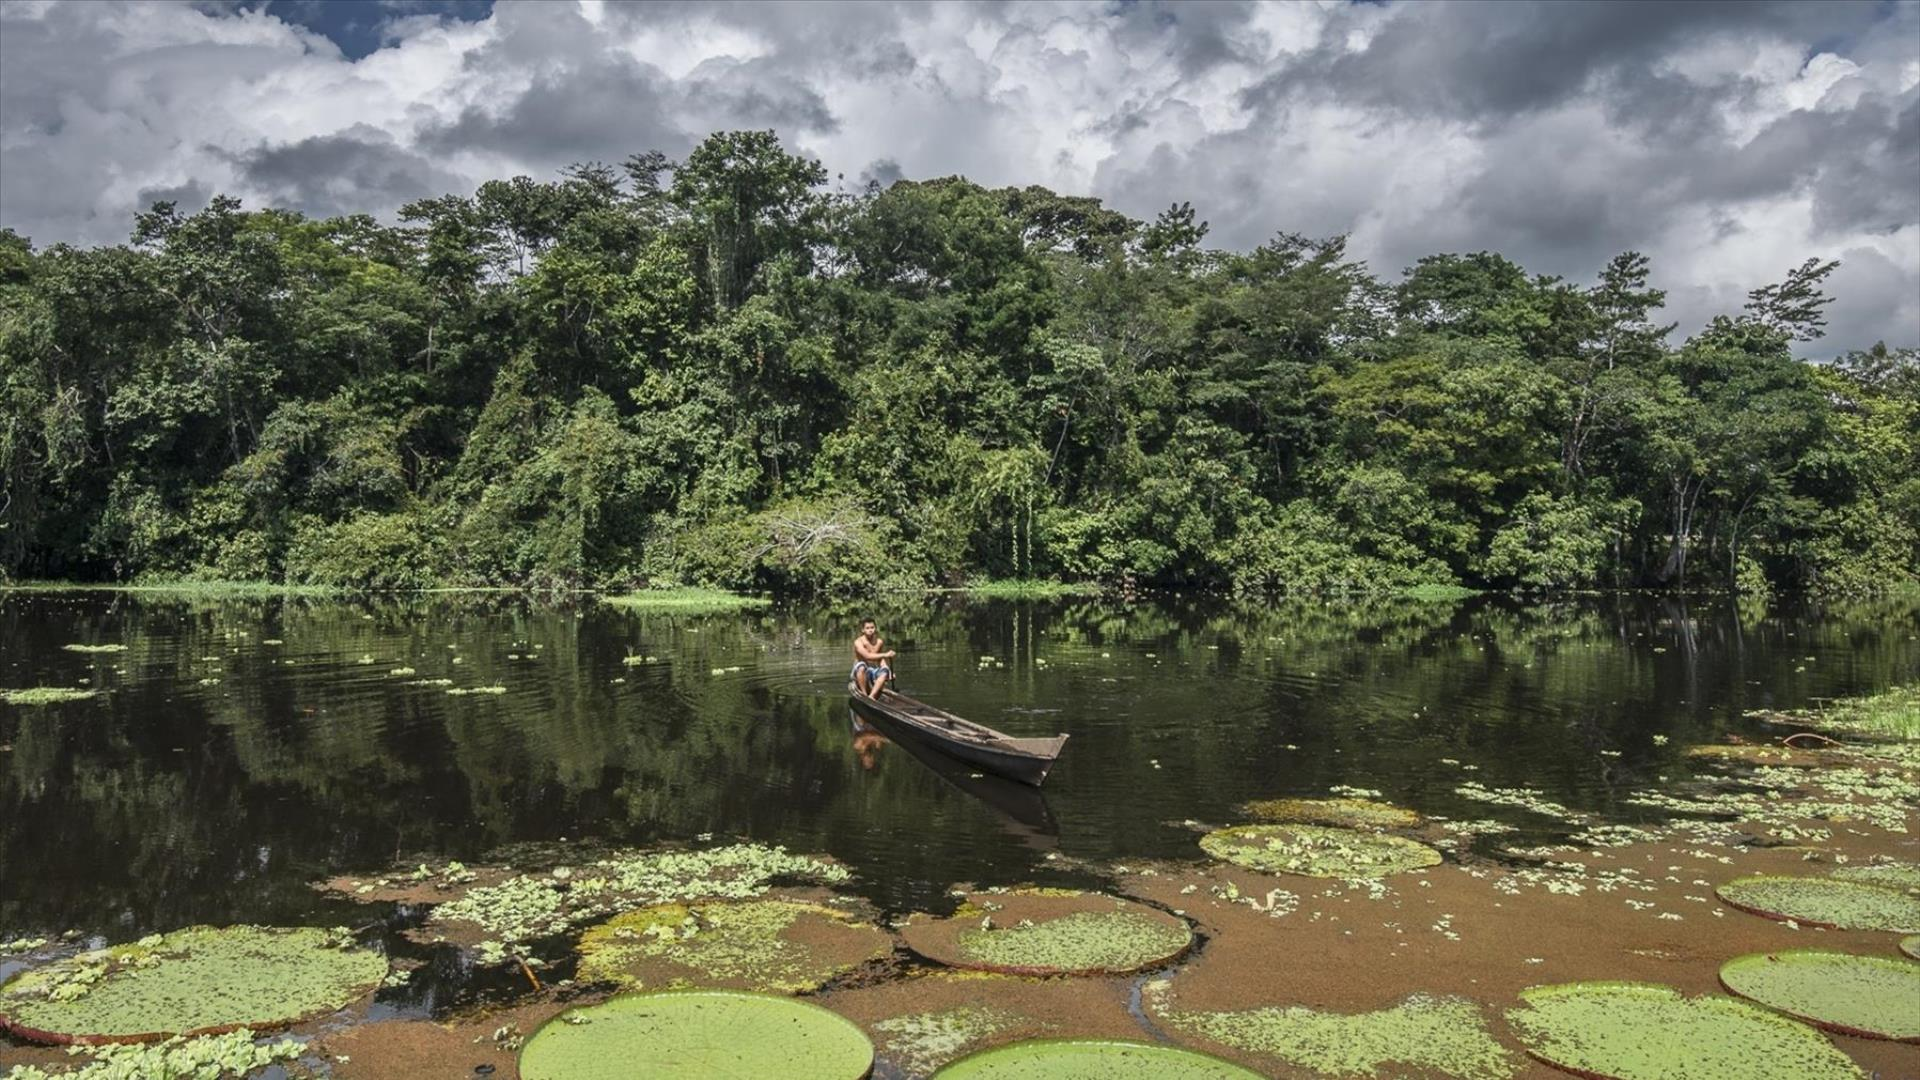 Brasilien | Rio de Janeiro, Foz do Iguacu, Urubici, Florianopolis, Amazonas, Salvador: 16 Tage Aktivreise in Kleingruppe - Brasilien Aktiv